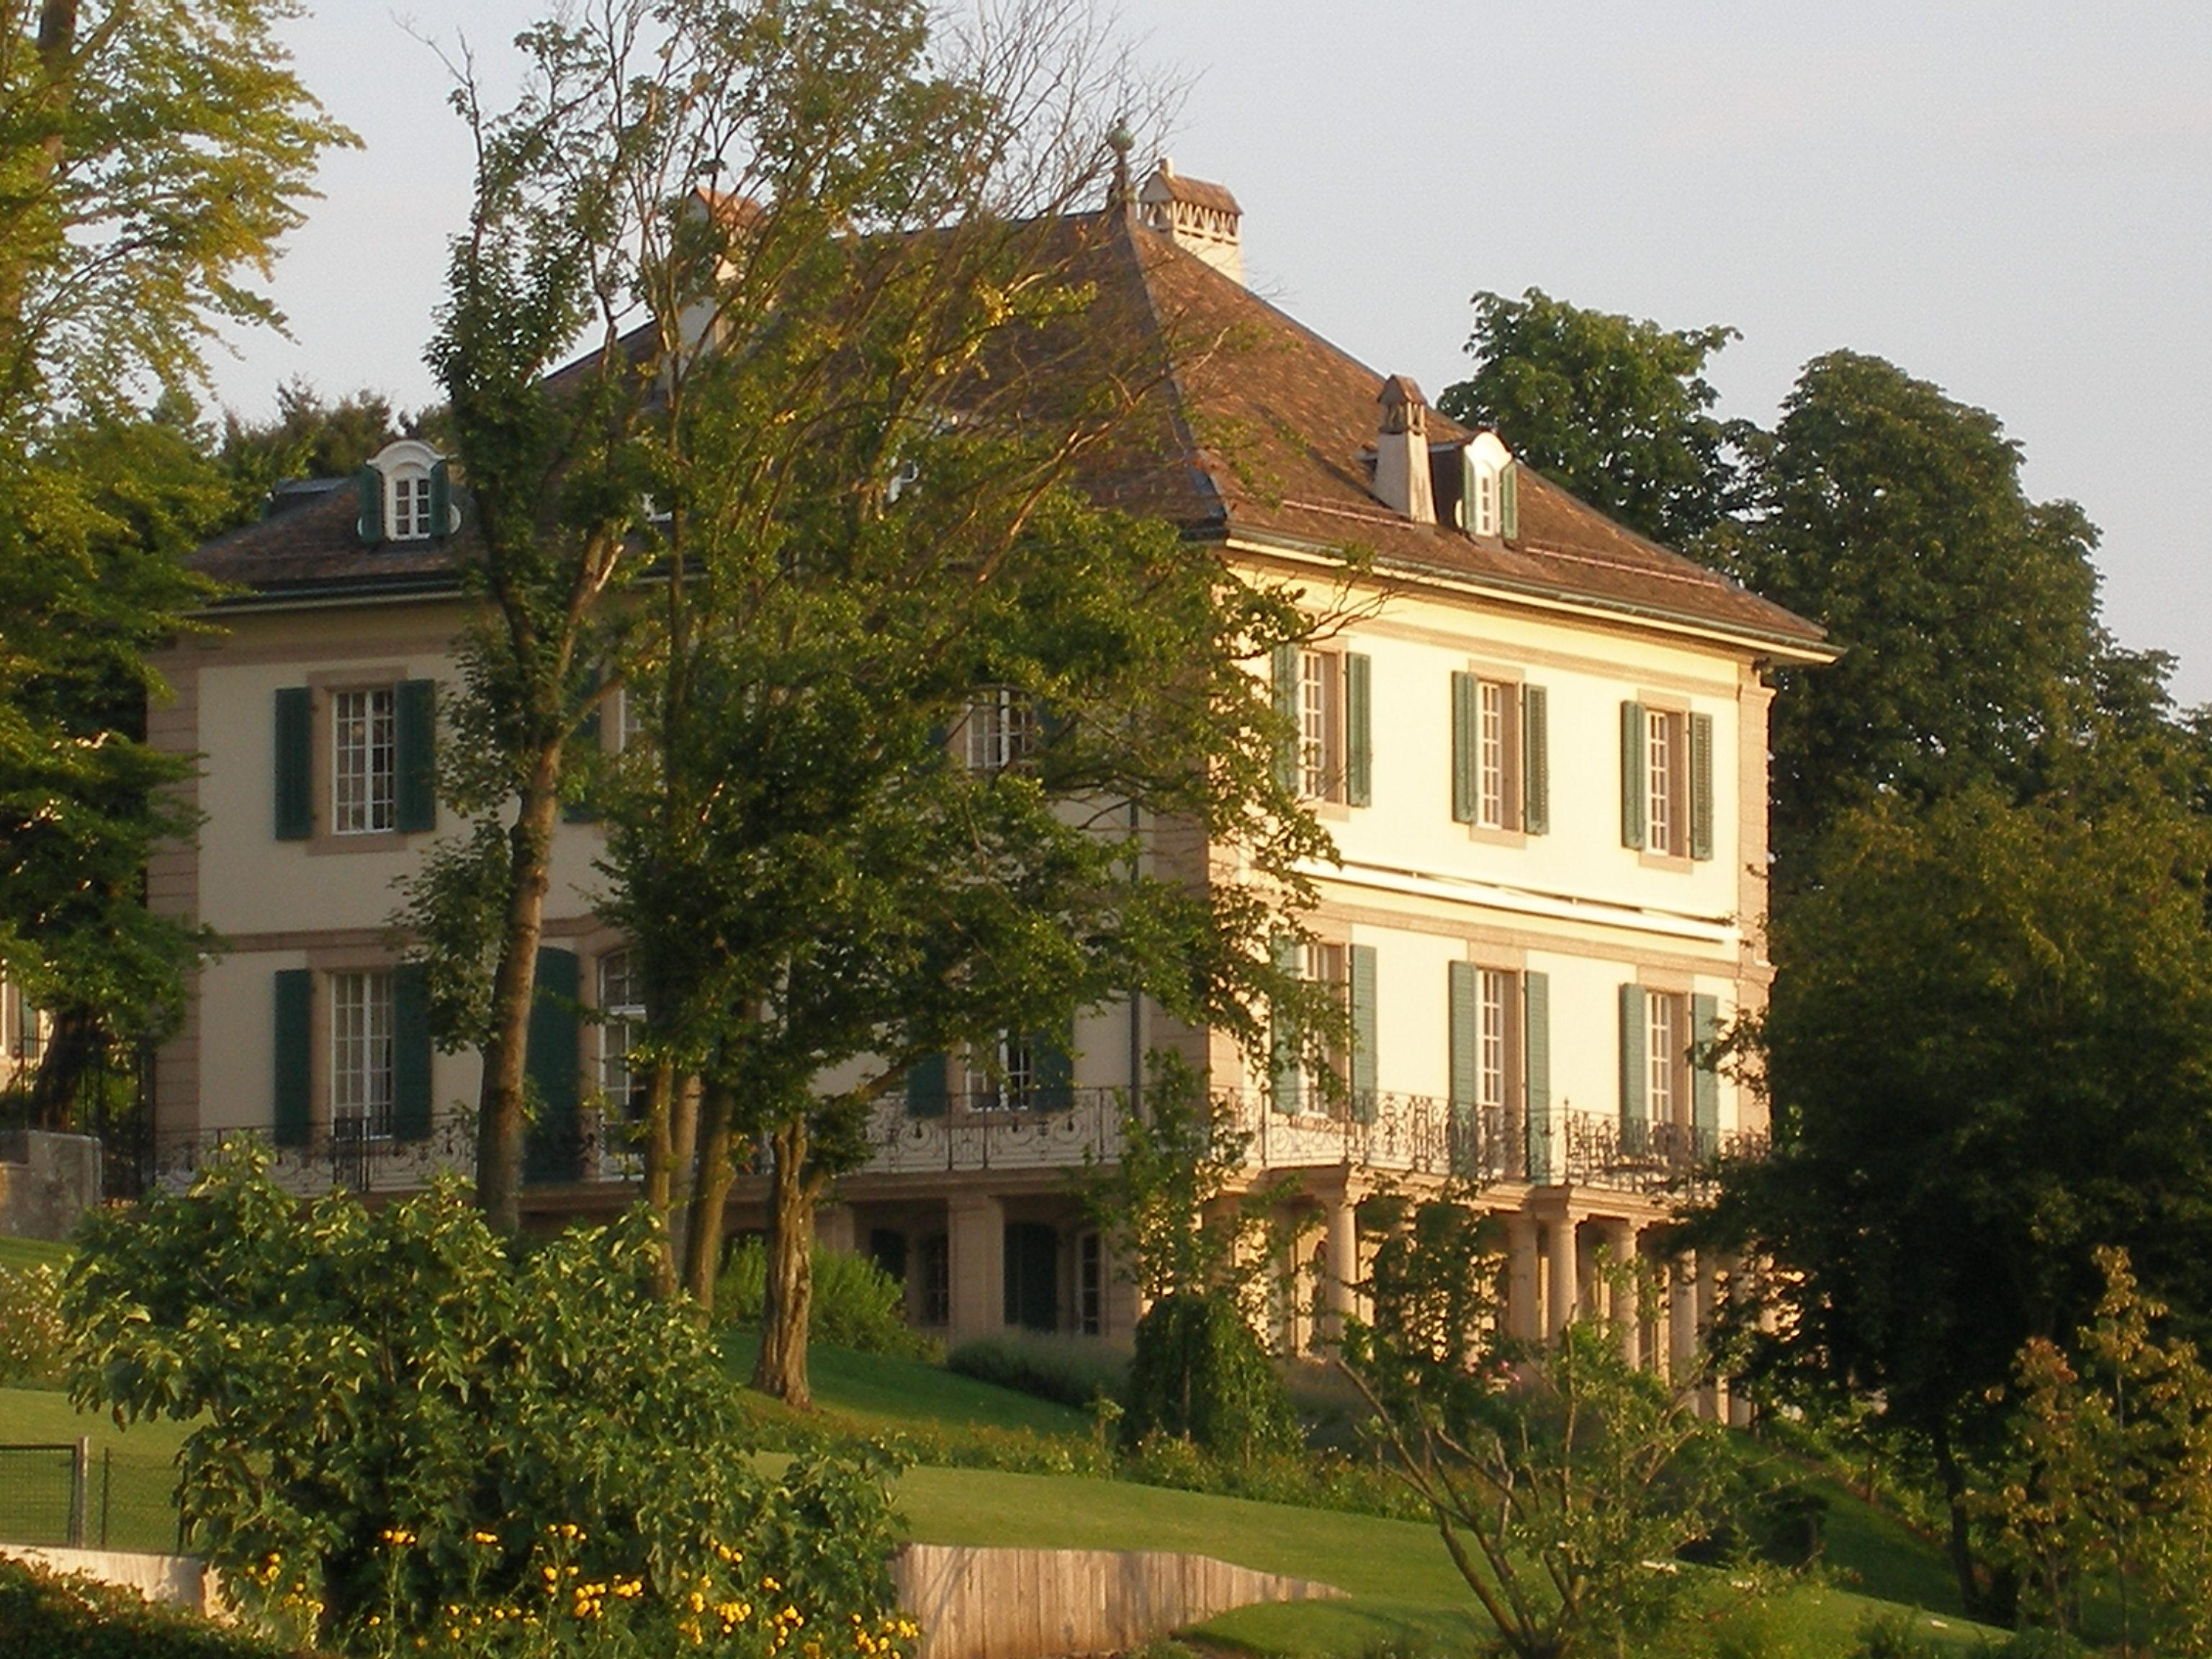 The Villa Diodati in Geneva, Switzerland. Photo taken by Robert Grassi on July 27, 2008.